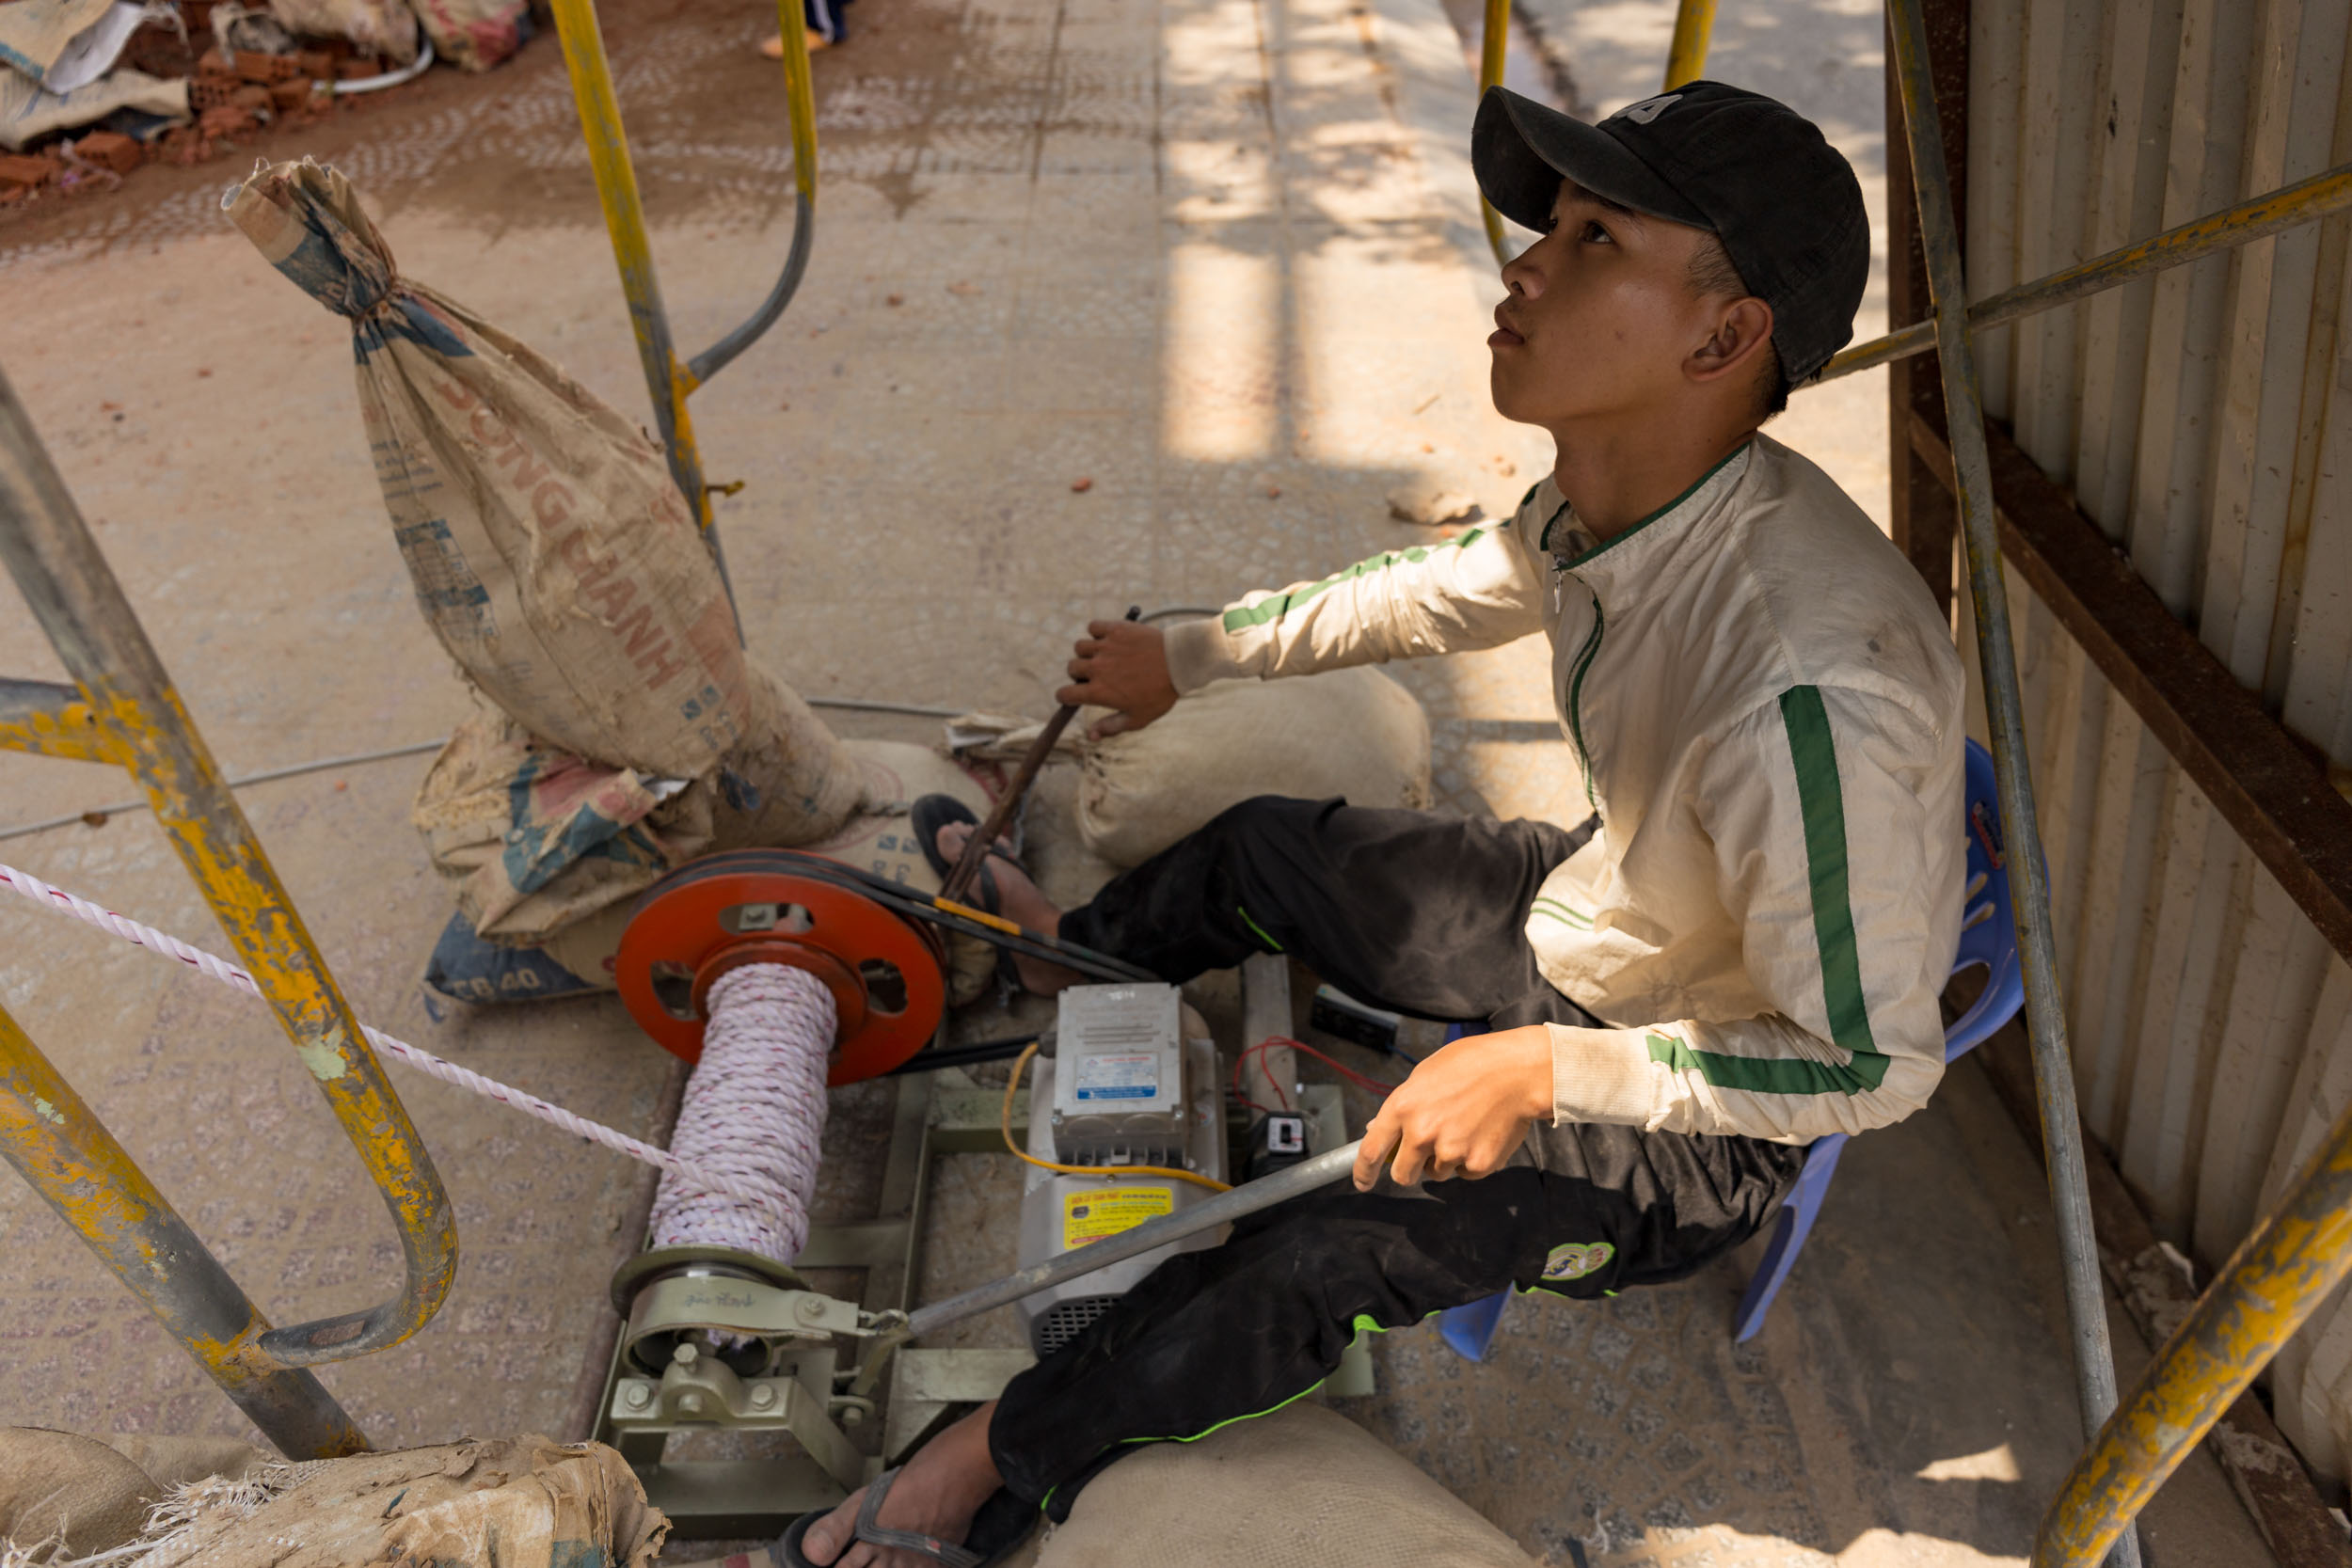 Vietnamese Youth Worker on Construction Site, Da Nang.